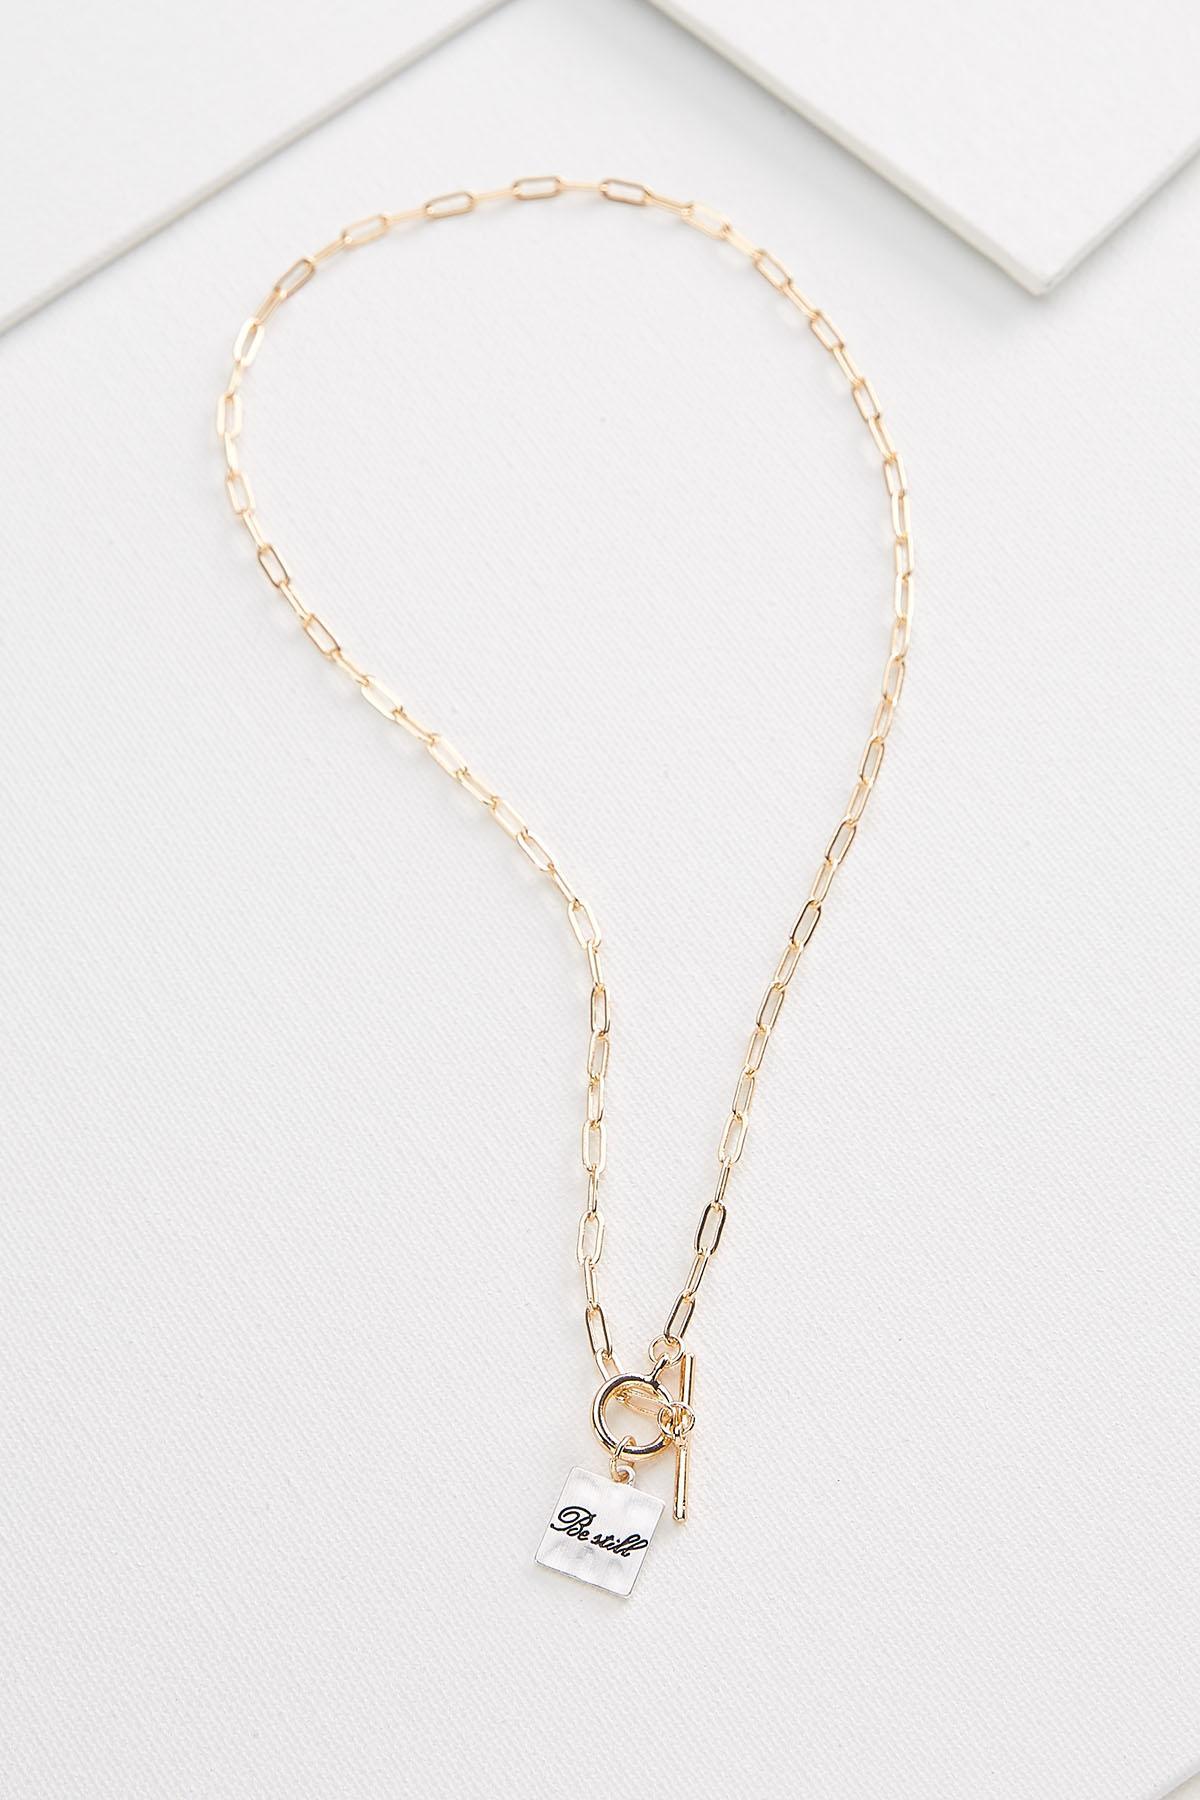 Be Still Pendant Necklace